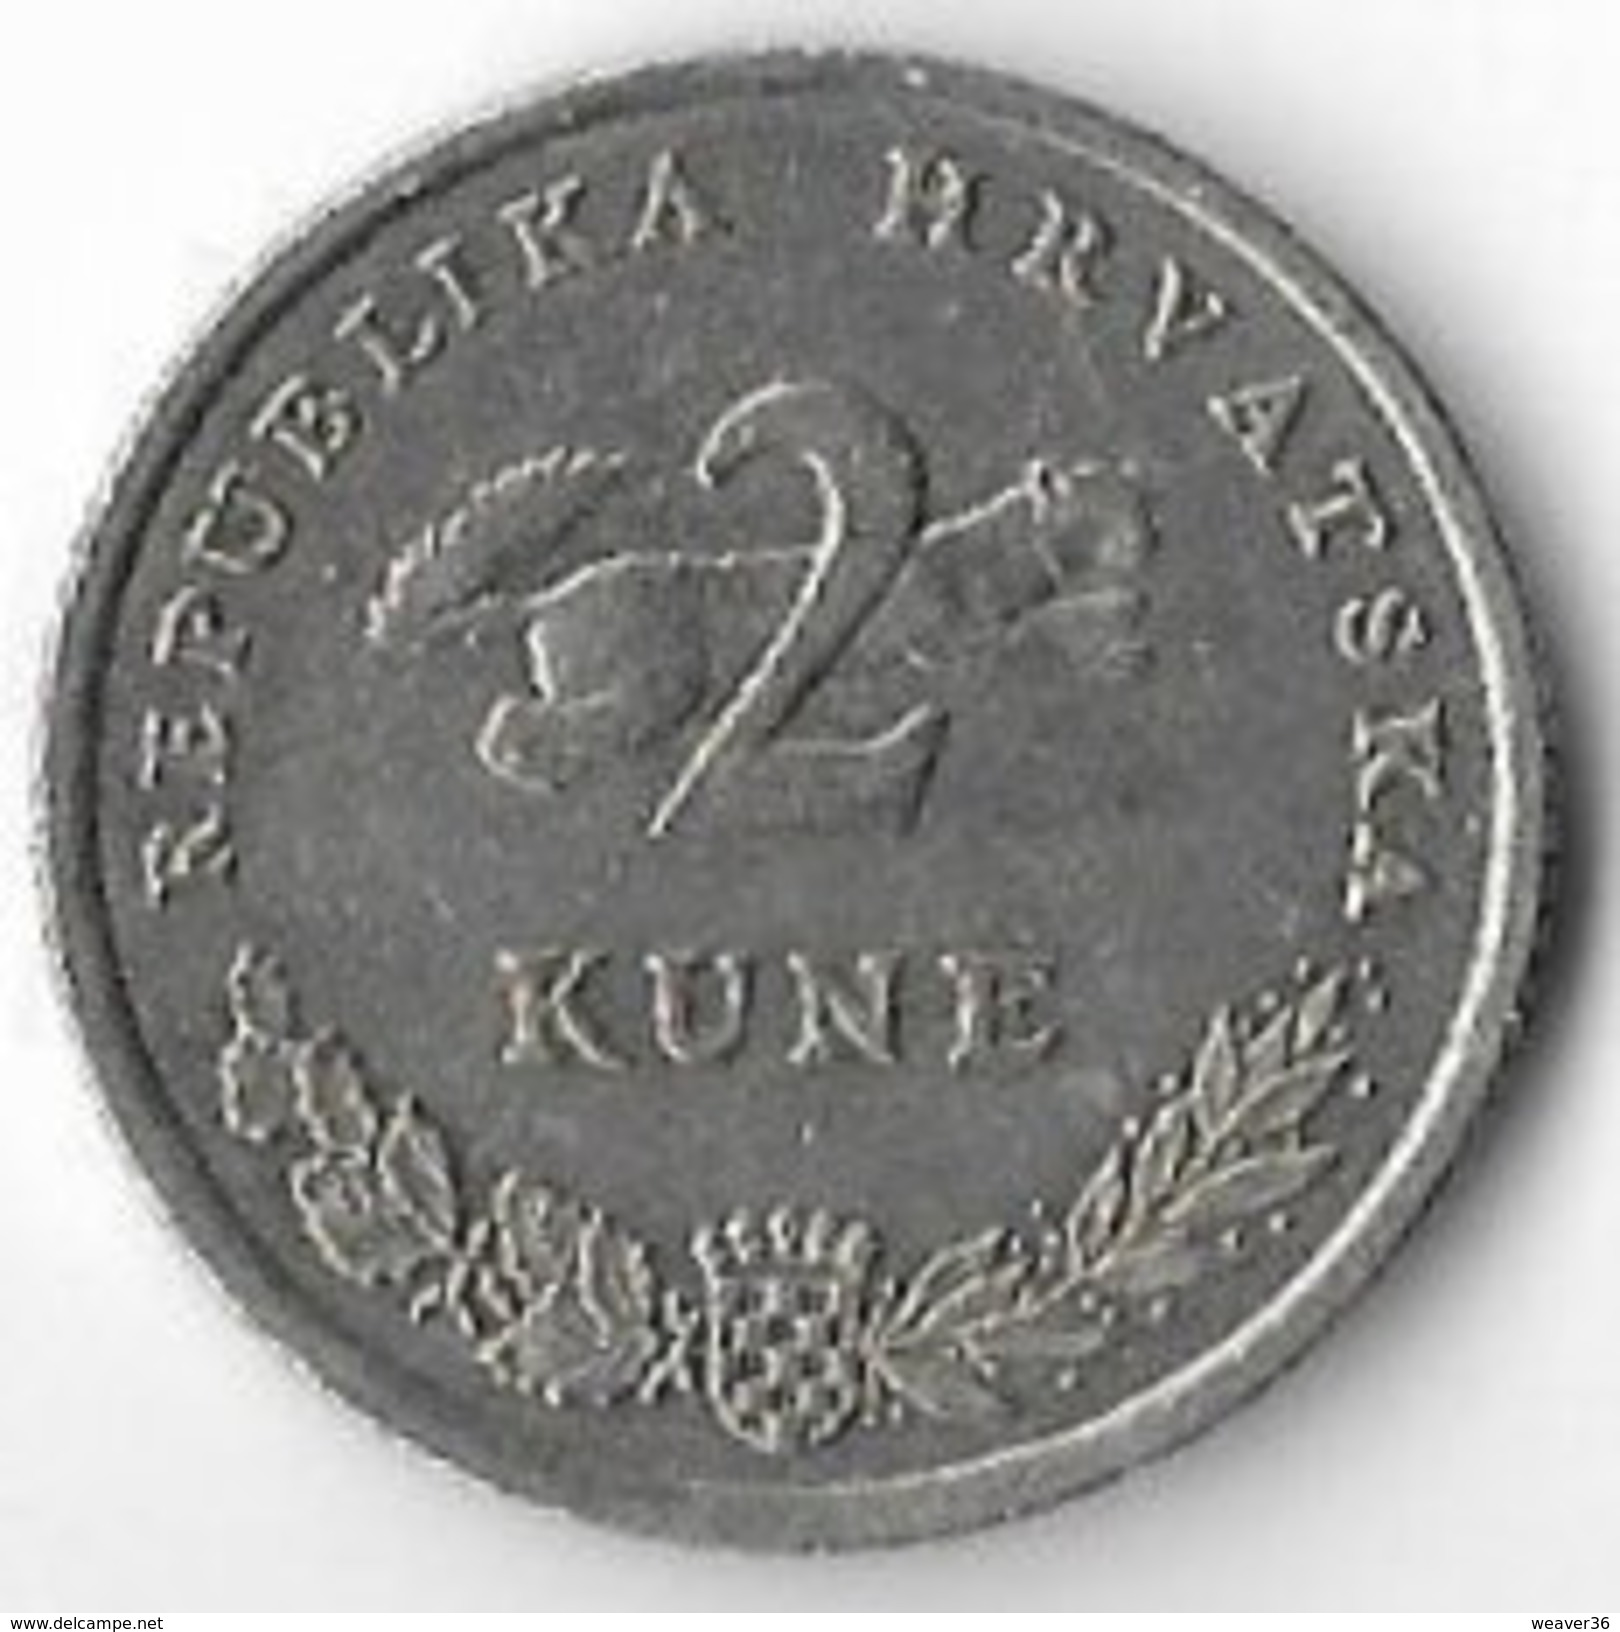 Croatia 2005 2 Kuna [C312/1D] - Croatia